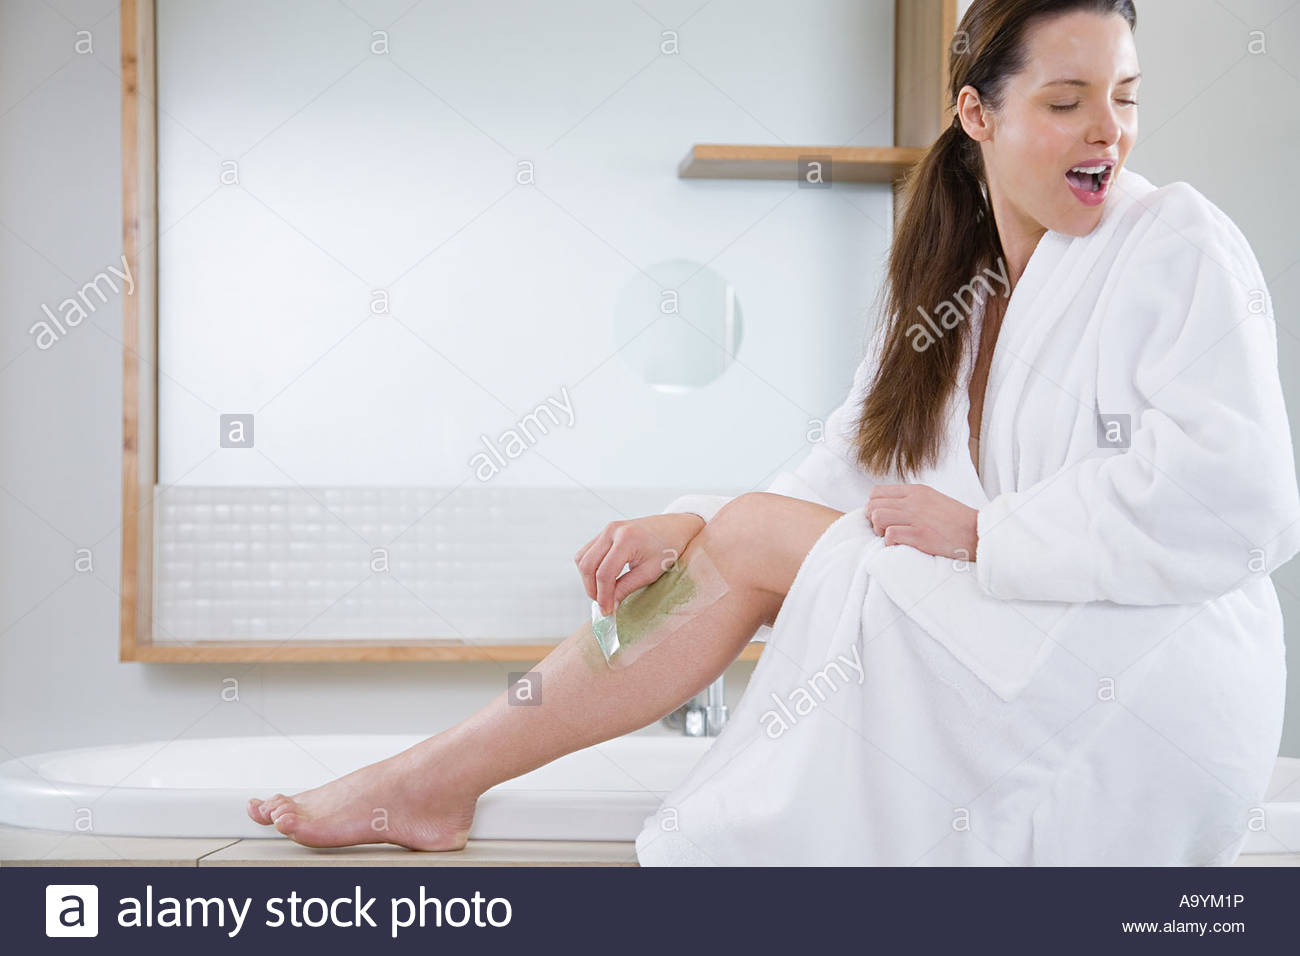 Woman waxing leg - Stock Image